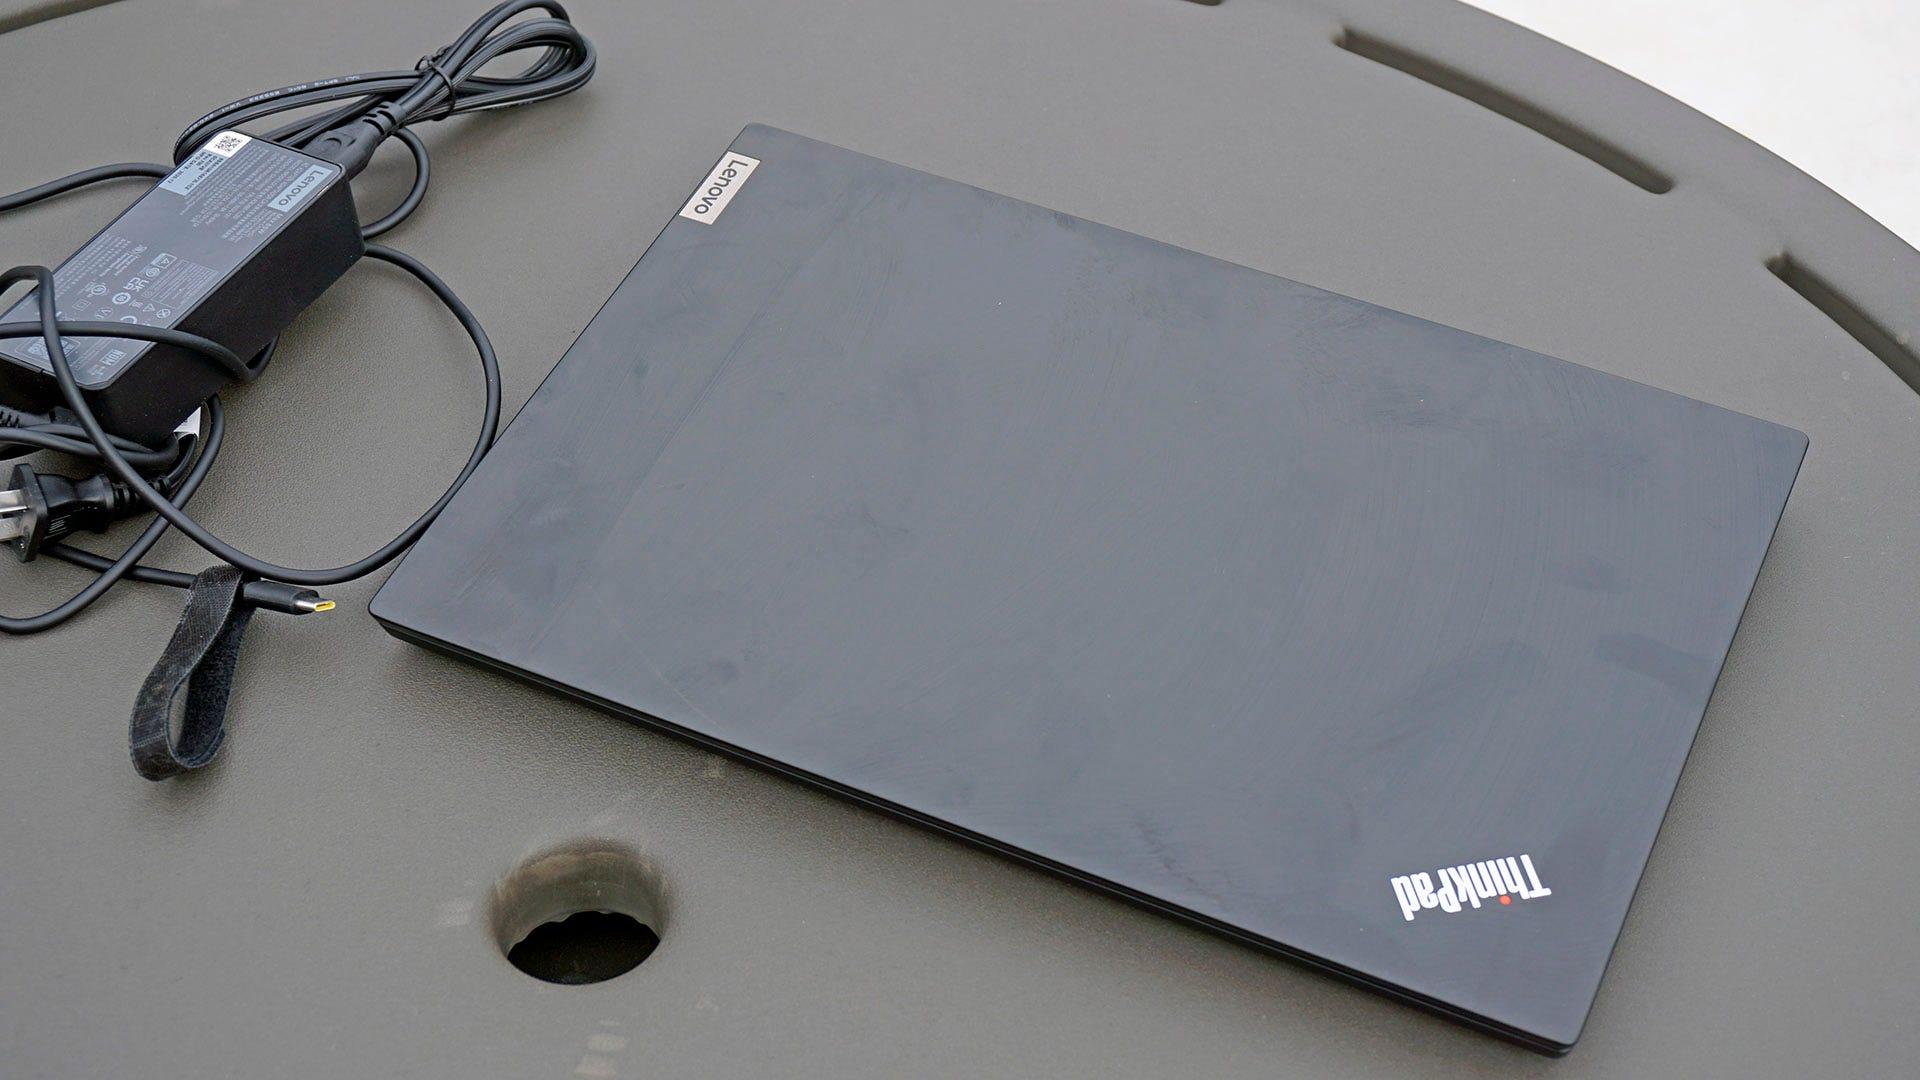 ThinkPad E14 with power cord